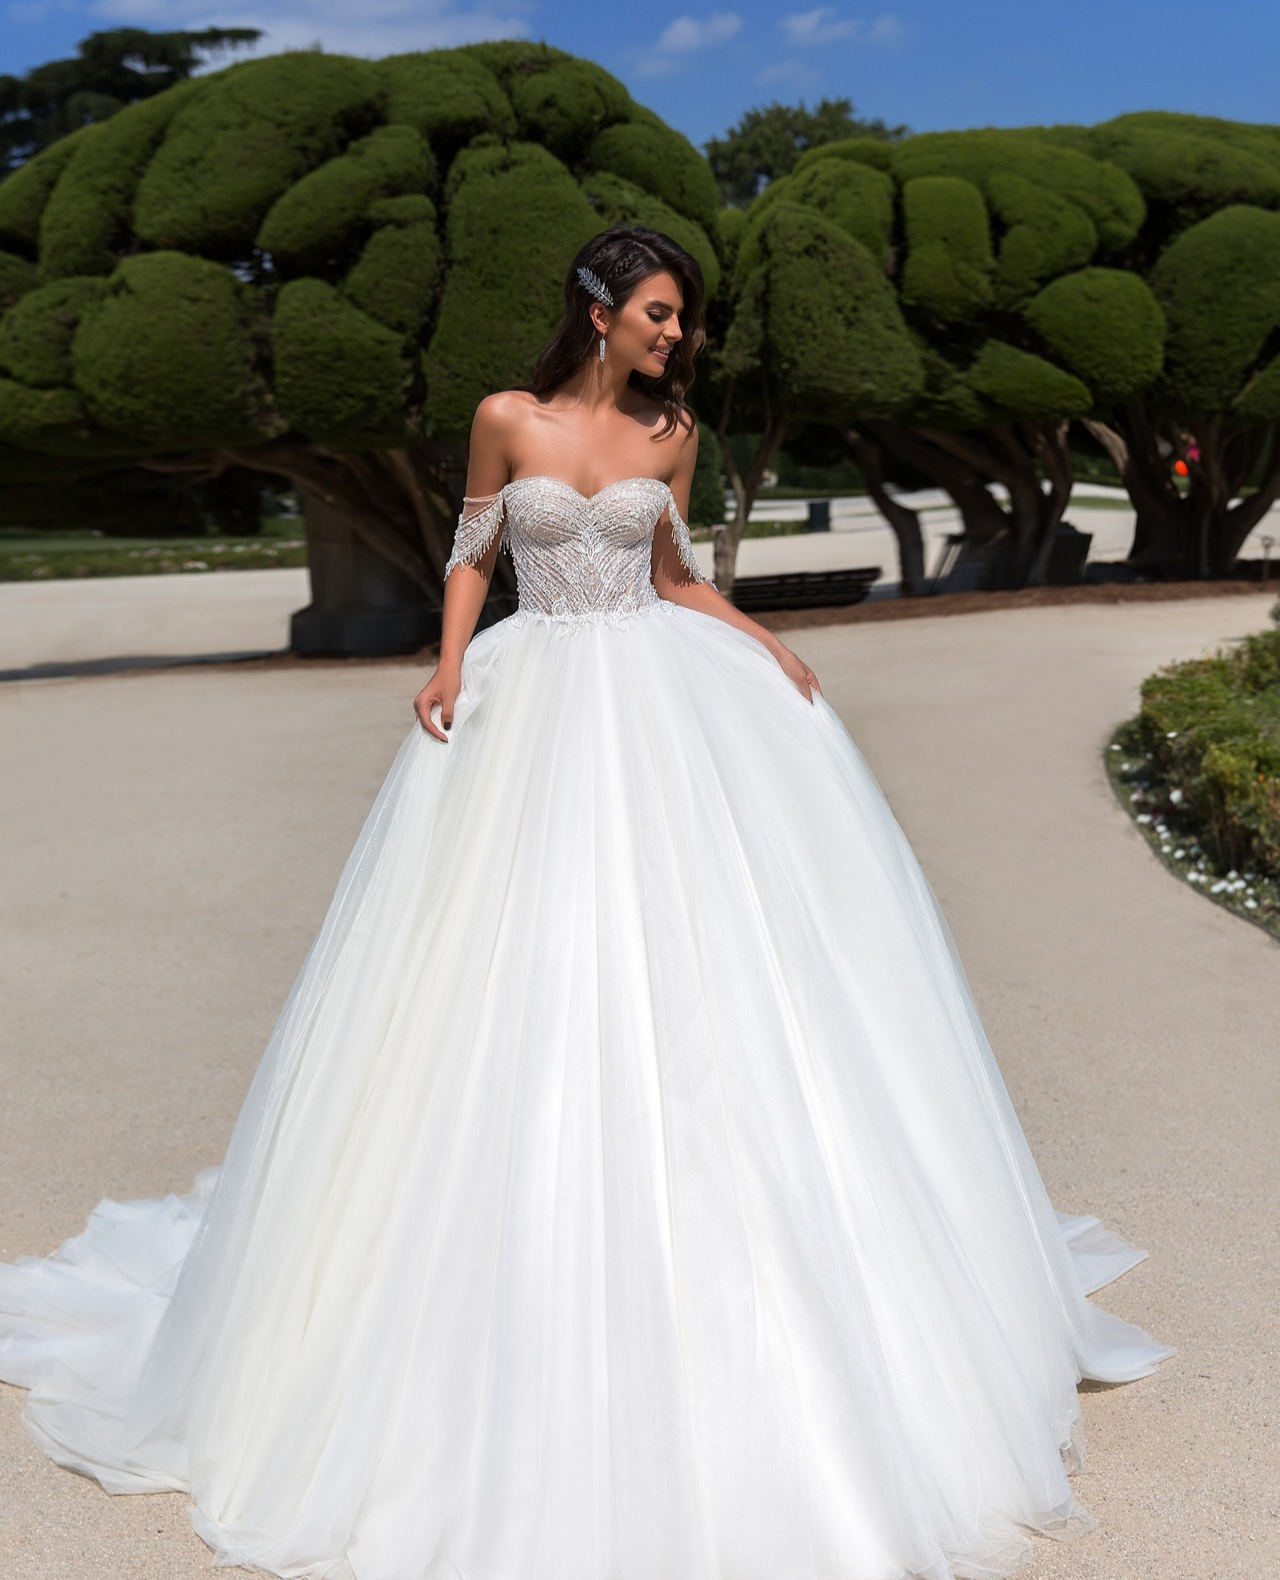 True Princess Gown From Vasylkov Ballgownweddingdress Princessweddingdress Straplessballgown Wedding Dresses Amazing Wedding Dress Wedding Dress Store [ 1580 x 1280 Pixel ]